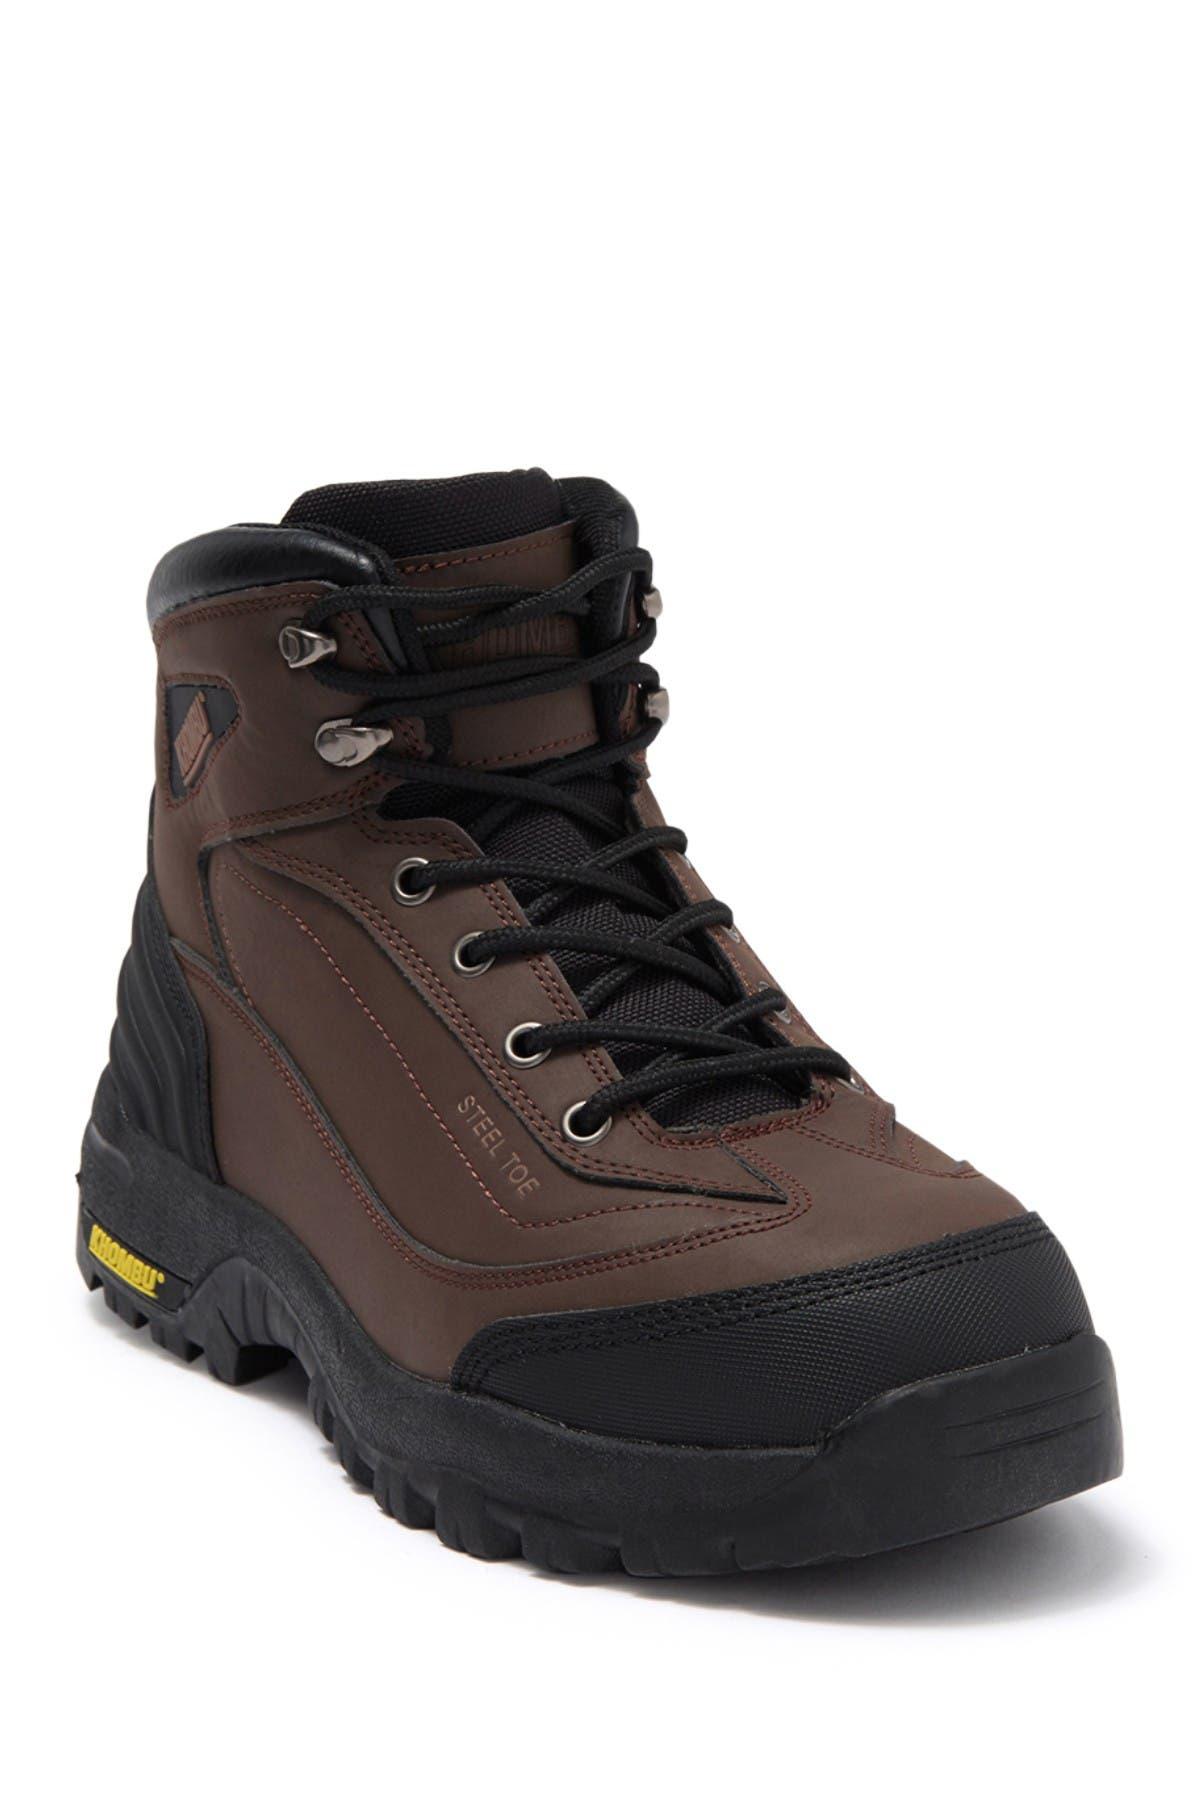 Image of Khombu Foundation Mid Ankle Snow Boot